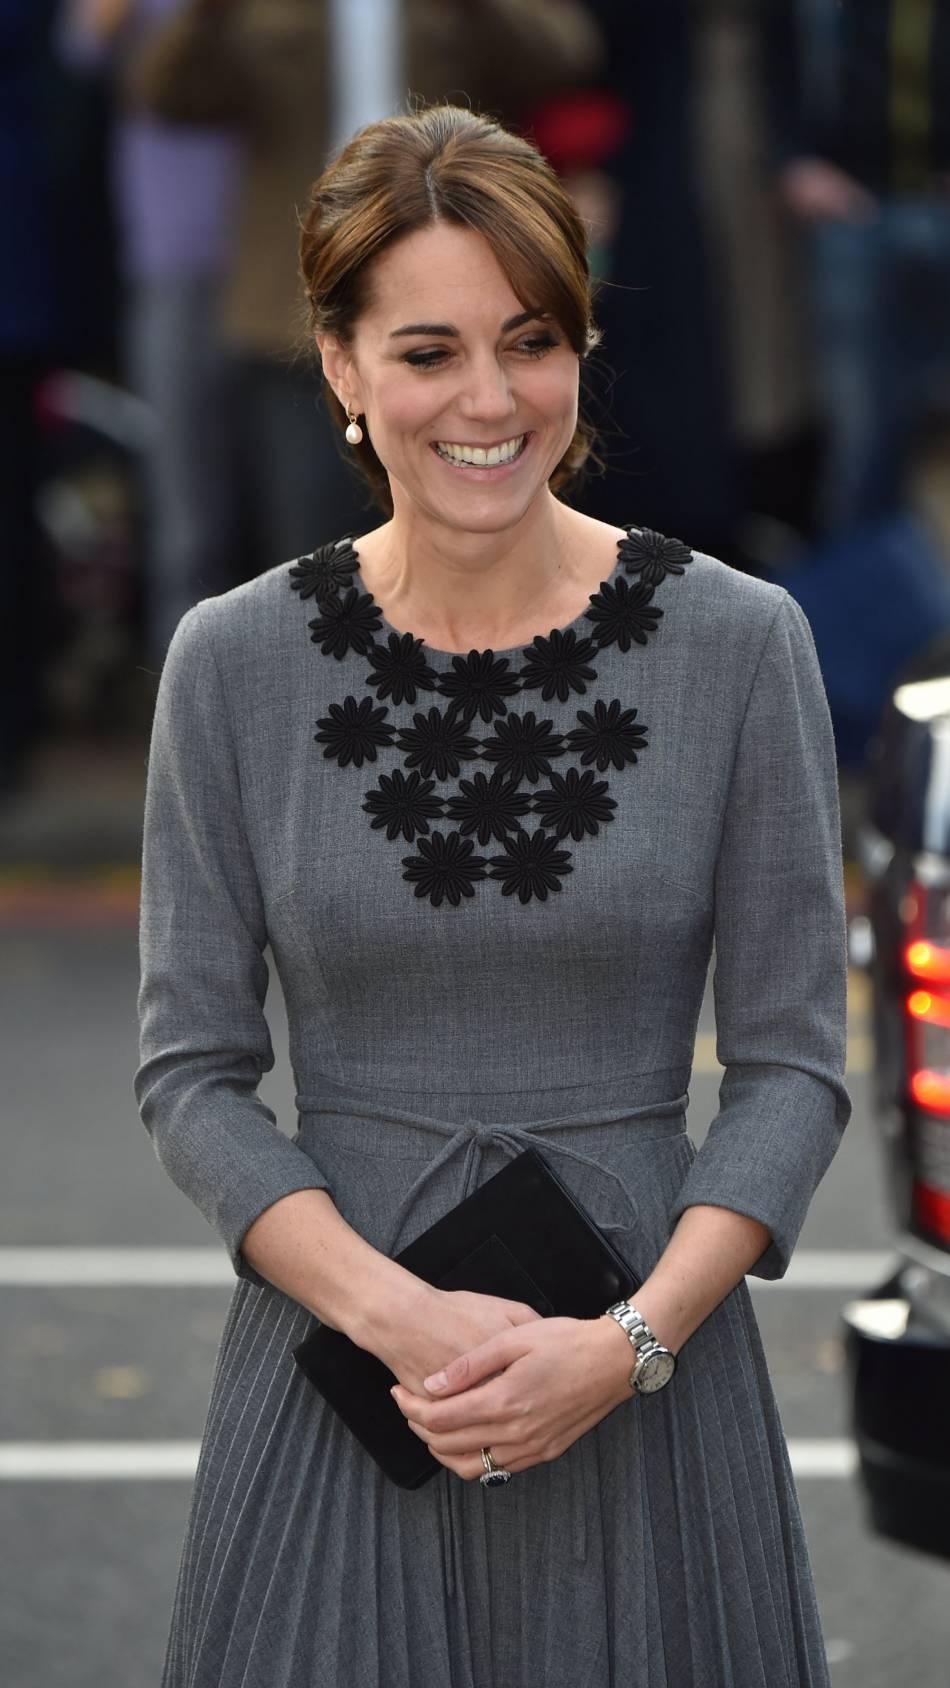 16de861c167 Kate Middleton   une mine radieuse ce mercredi 27 octobre 2015.